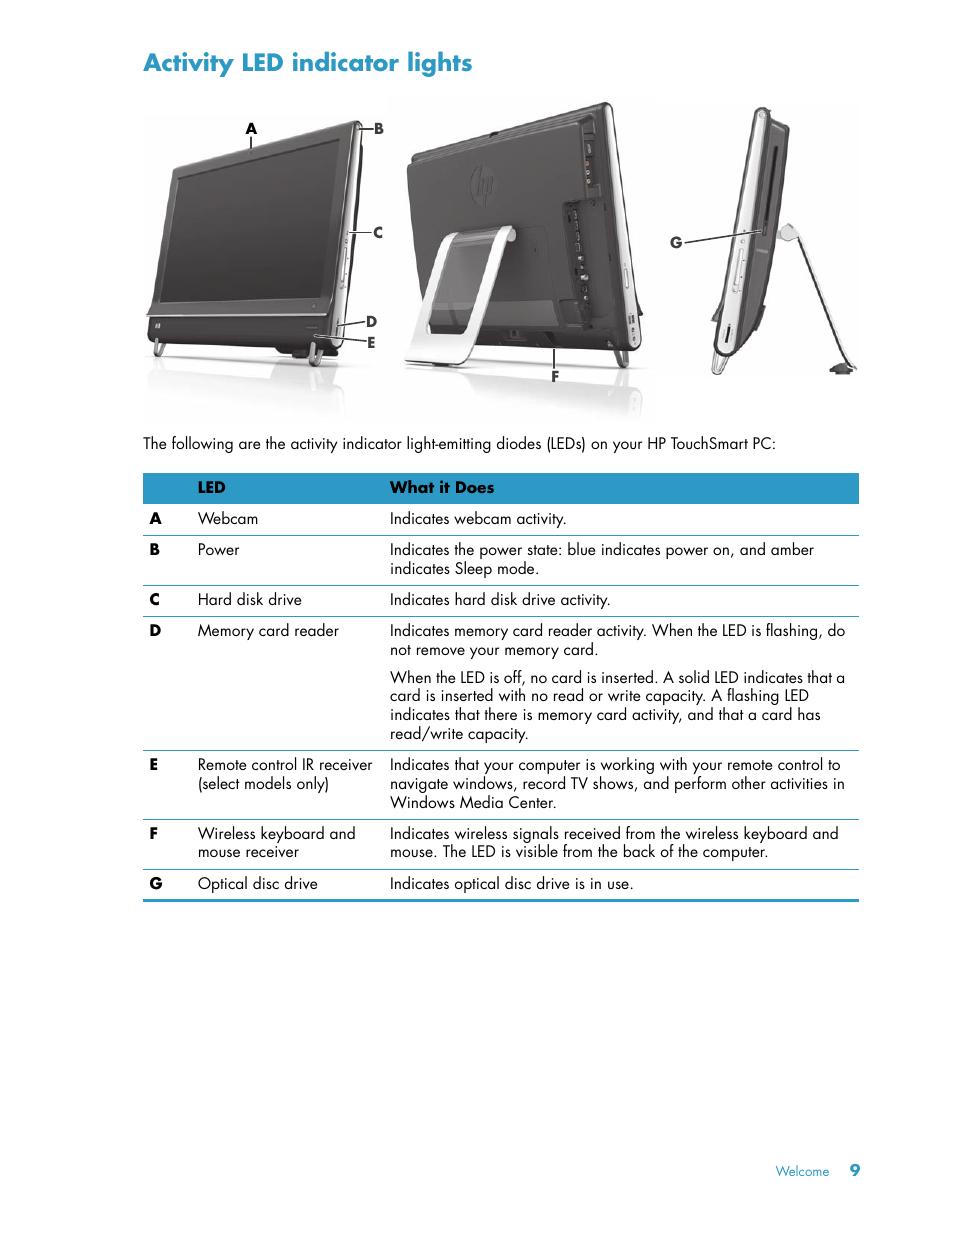 Activity led indicator lights | HP TouchSmart 600-1152 Desktop PC Manuel  d'utilisation | Page 15 / 148